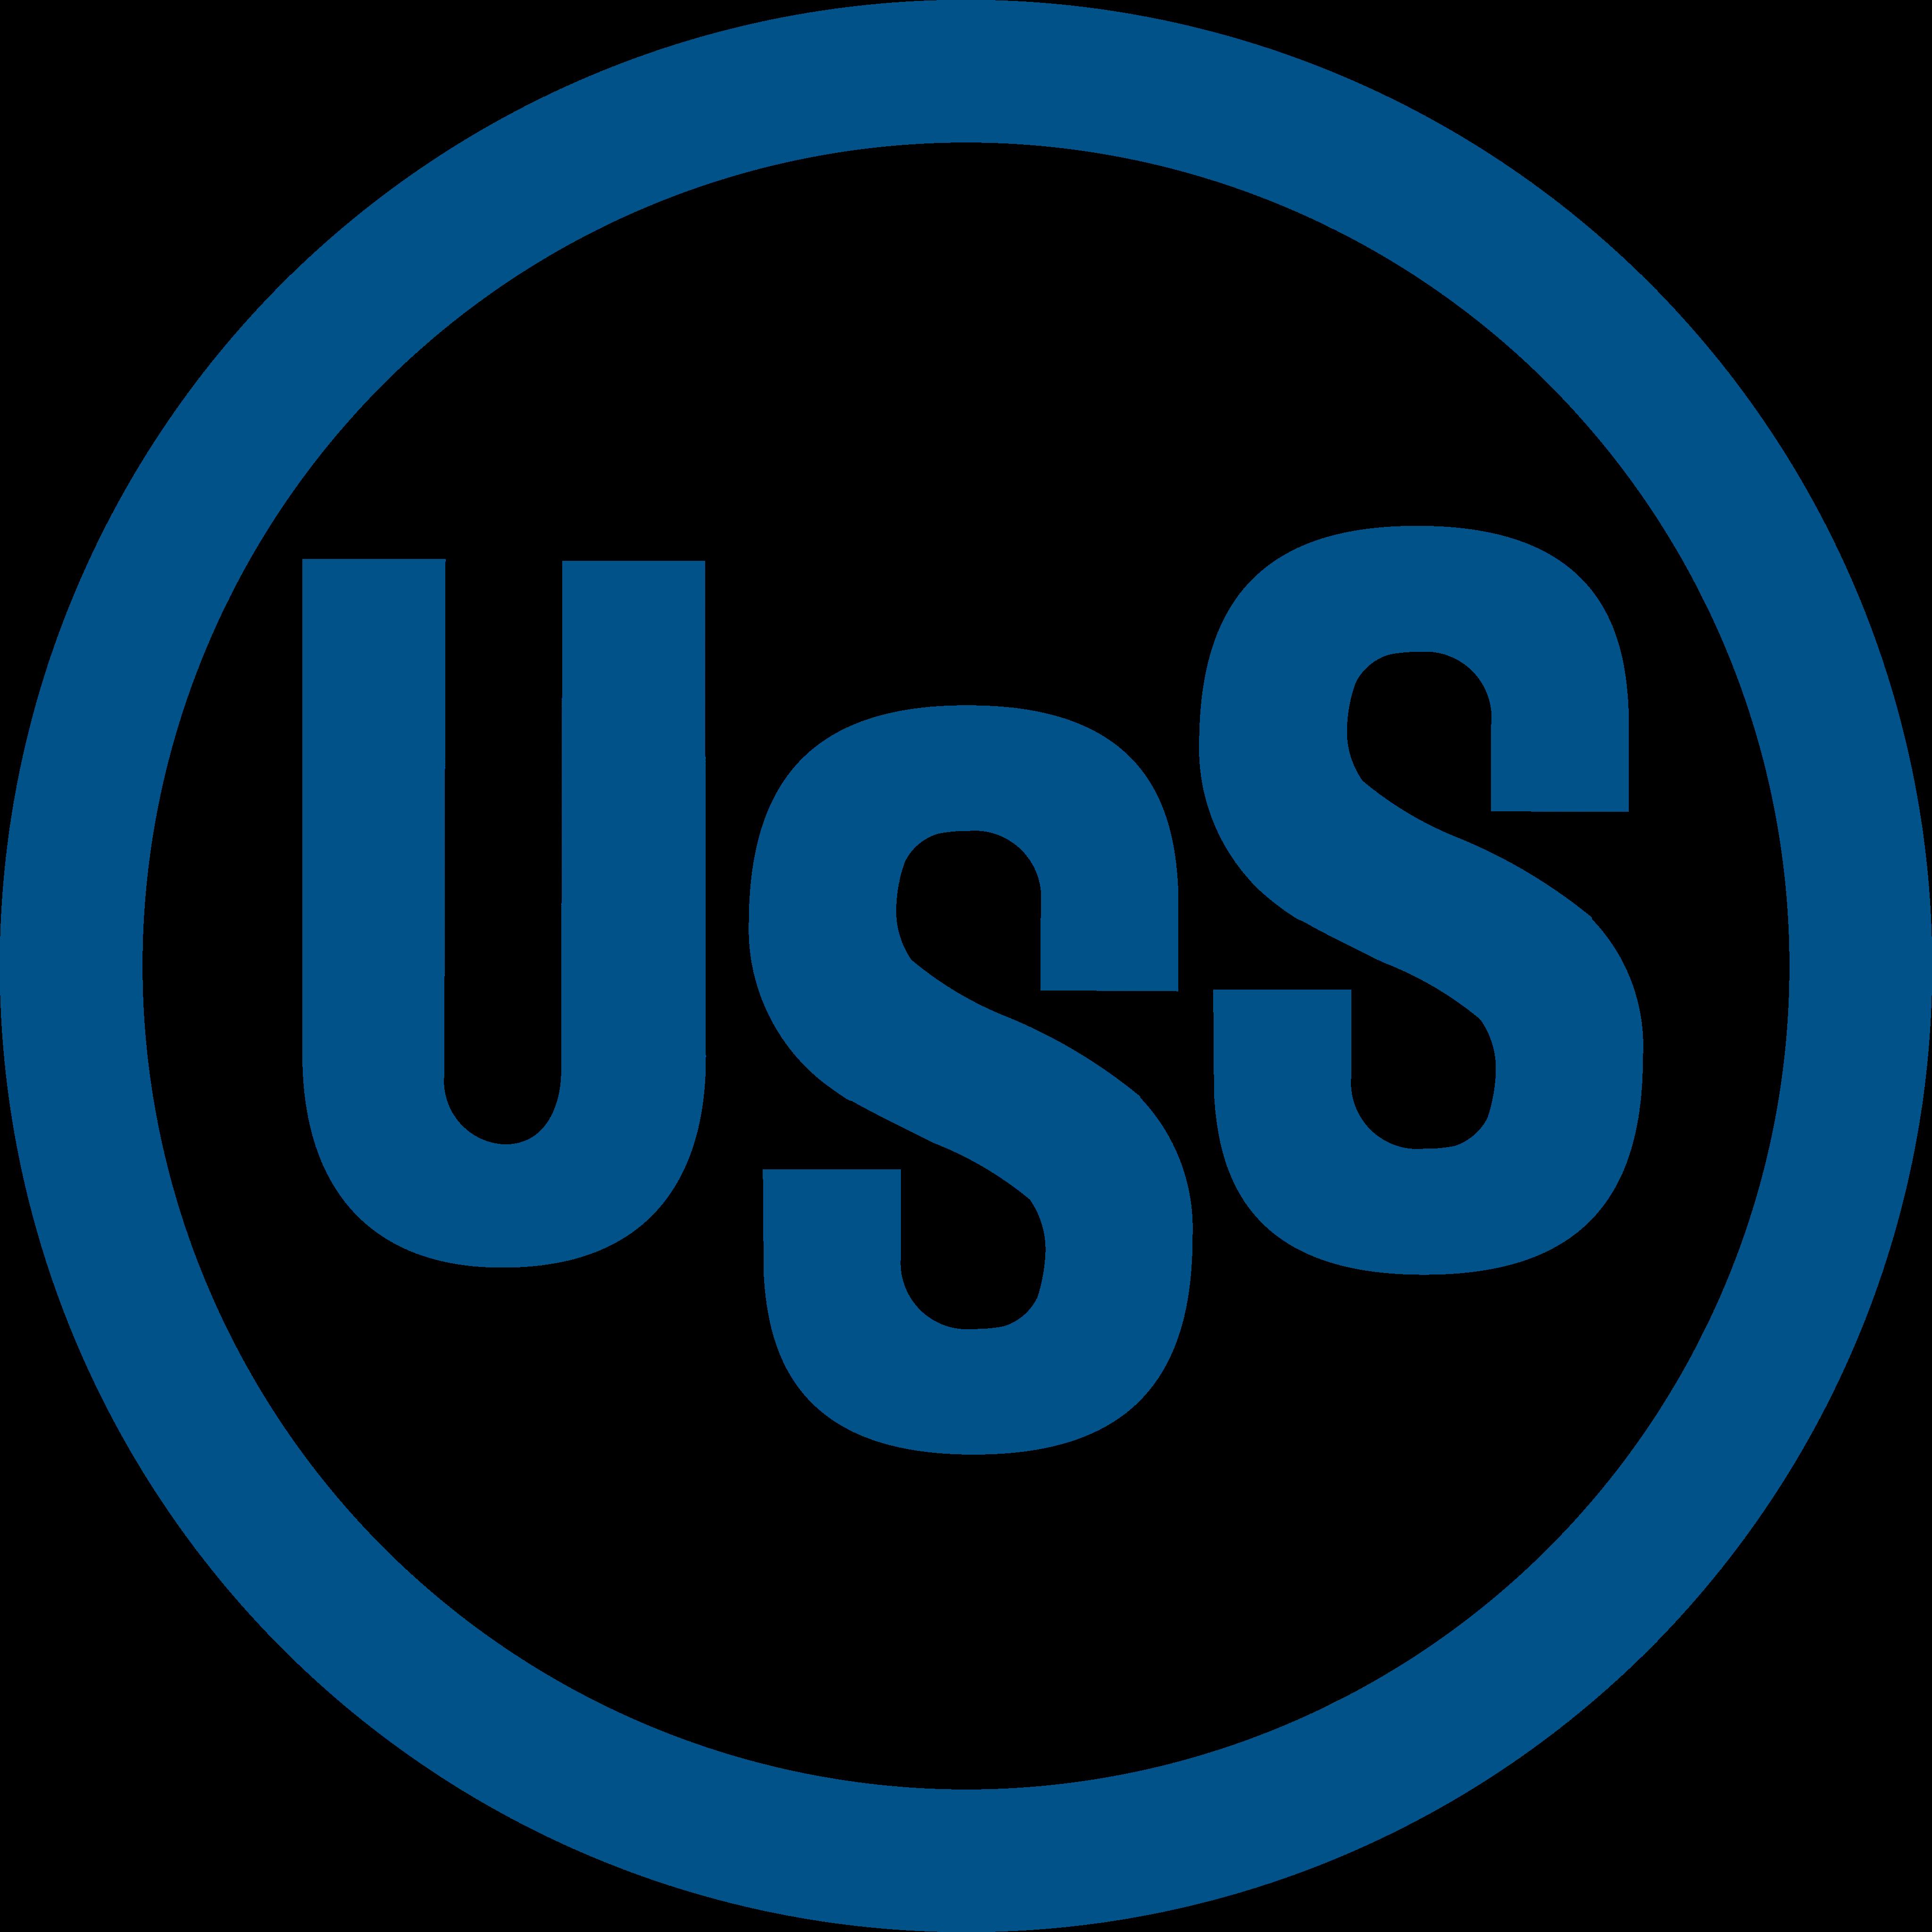 uss united states steel logo 1 - USS Logo - United States Steel Logo